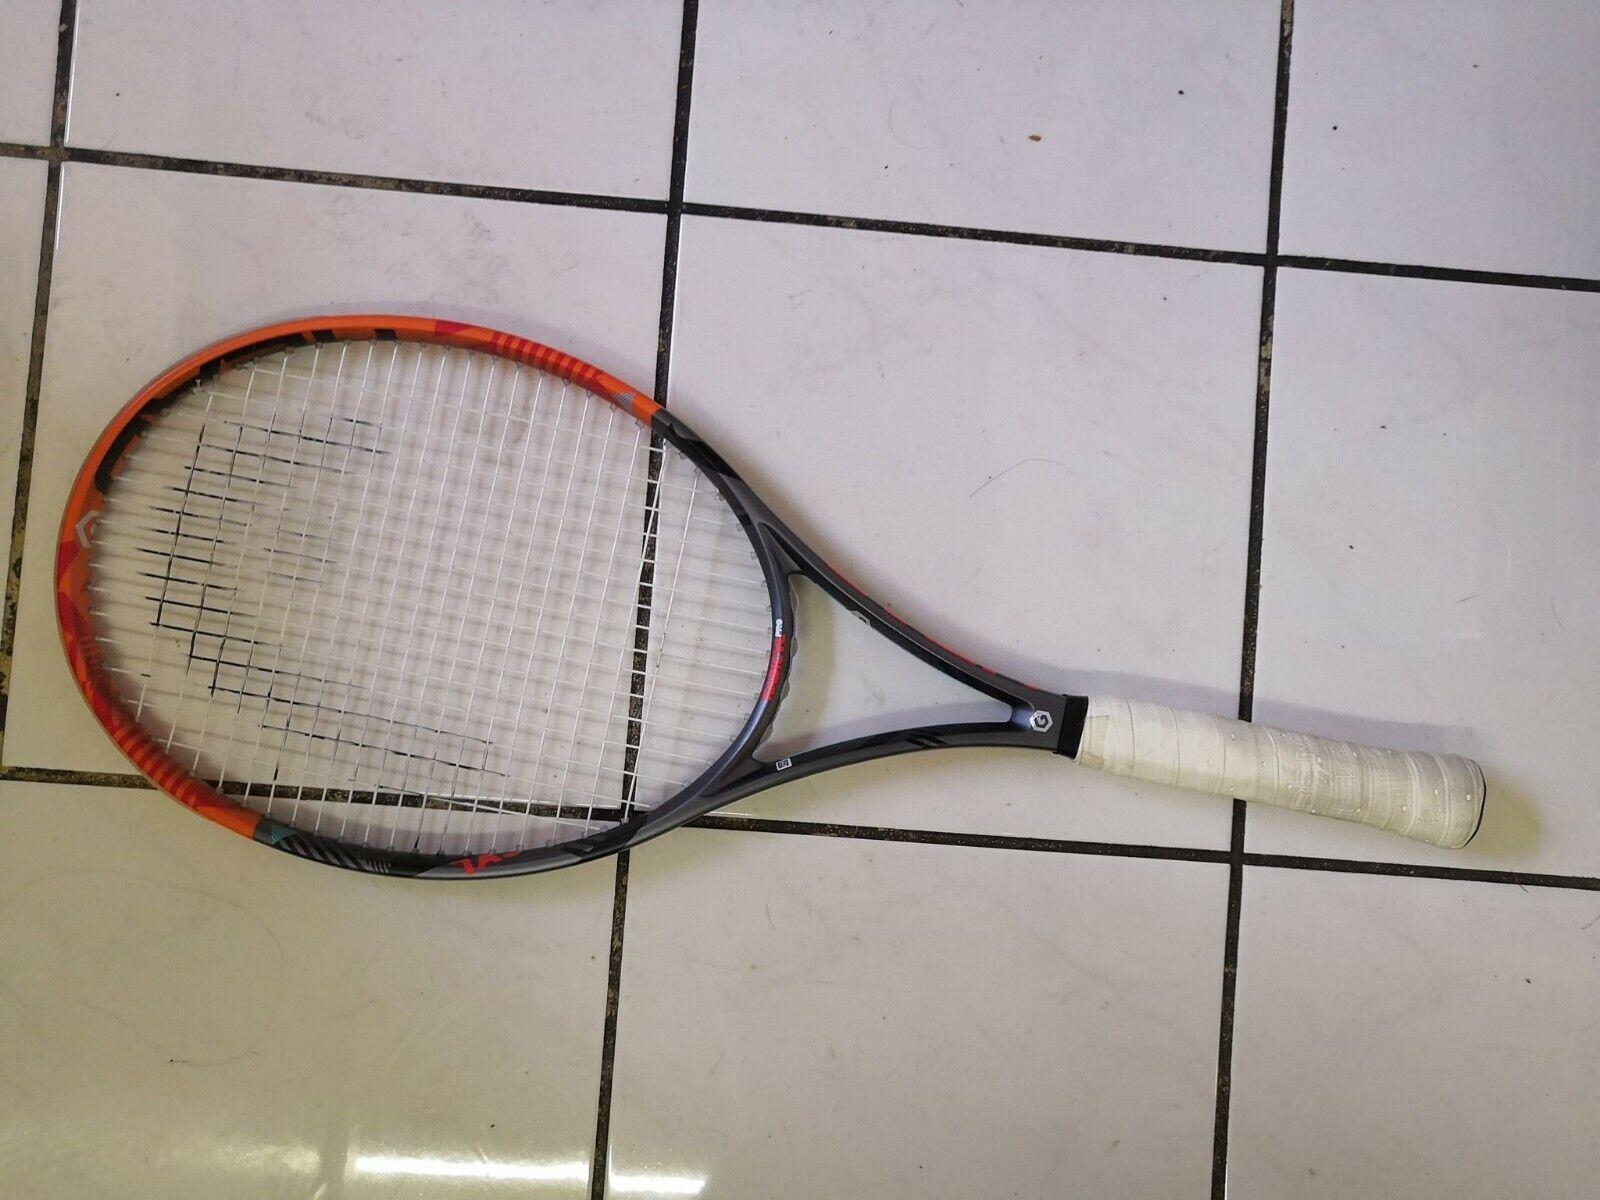 Cabeza graphenext Radical Pro 98  cabeza 4 1 2 Grip Tenis Raqueta  mejor precio